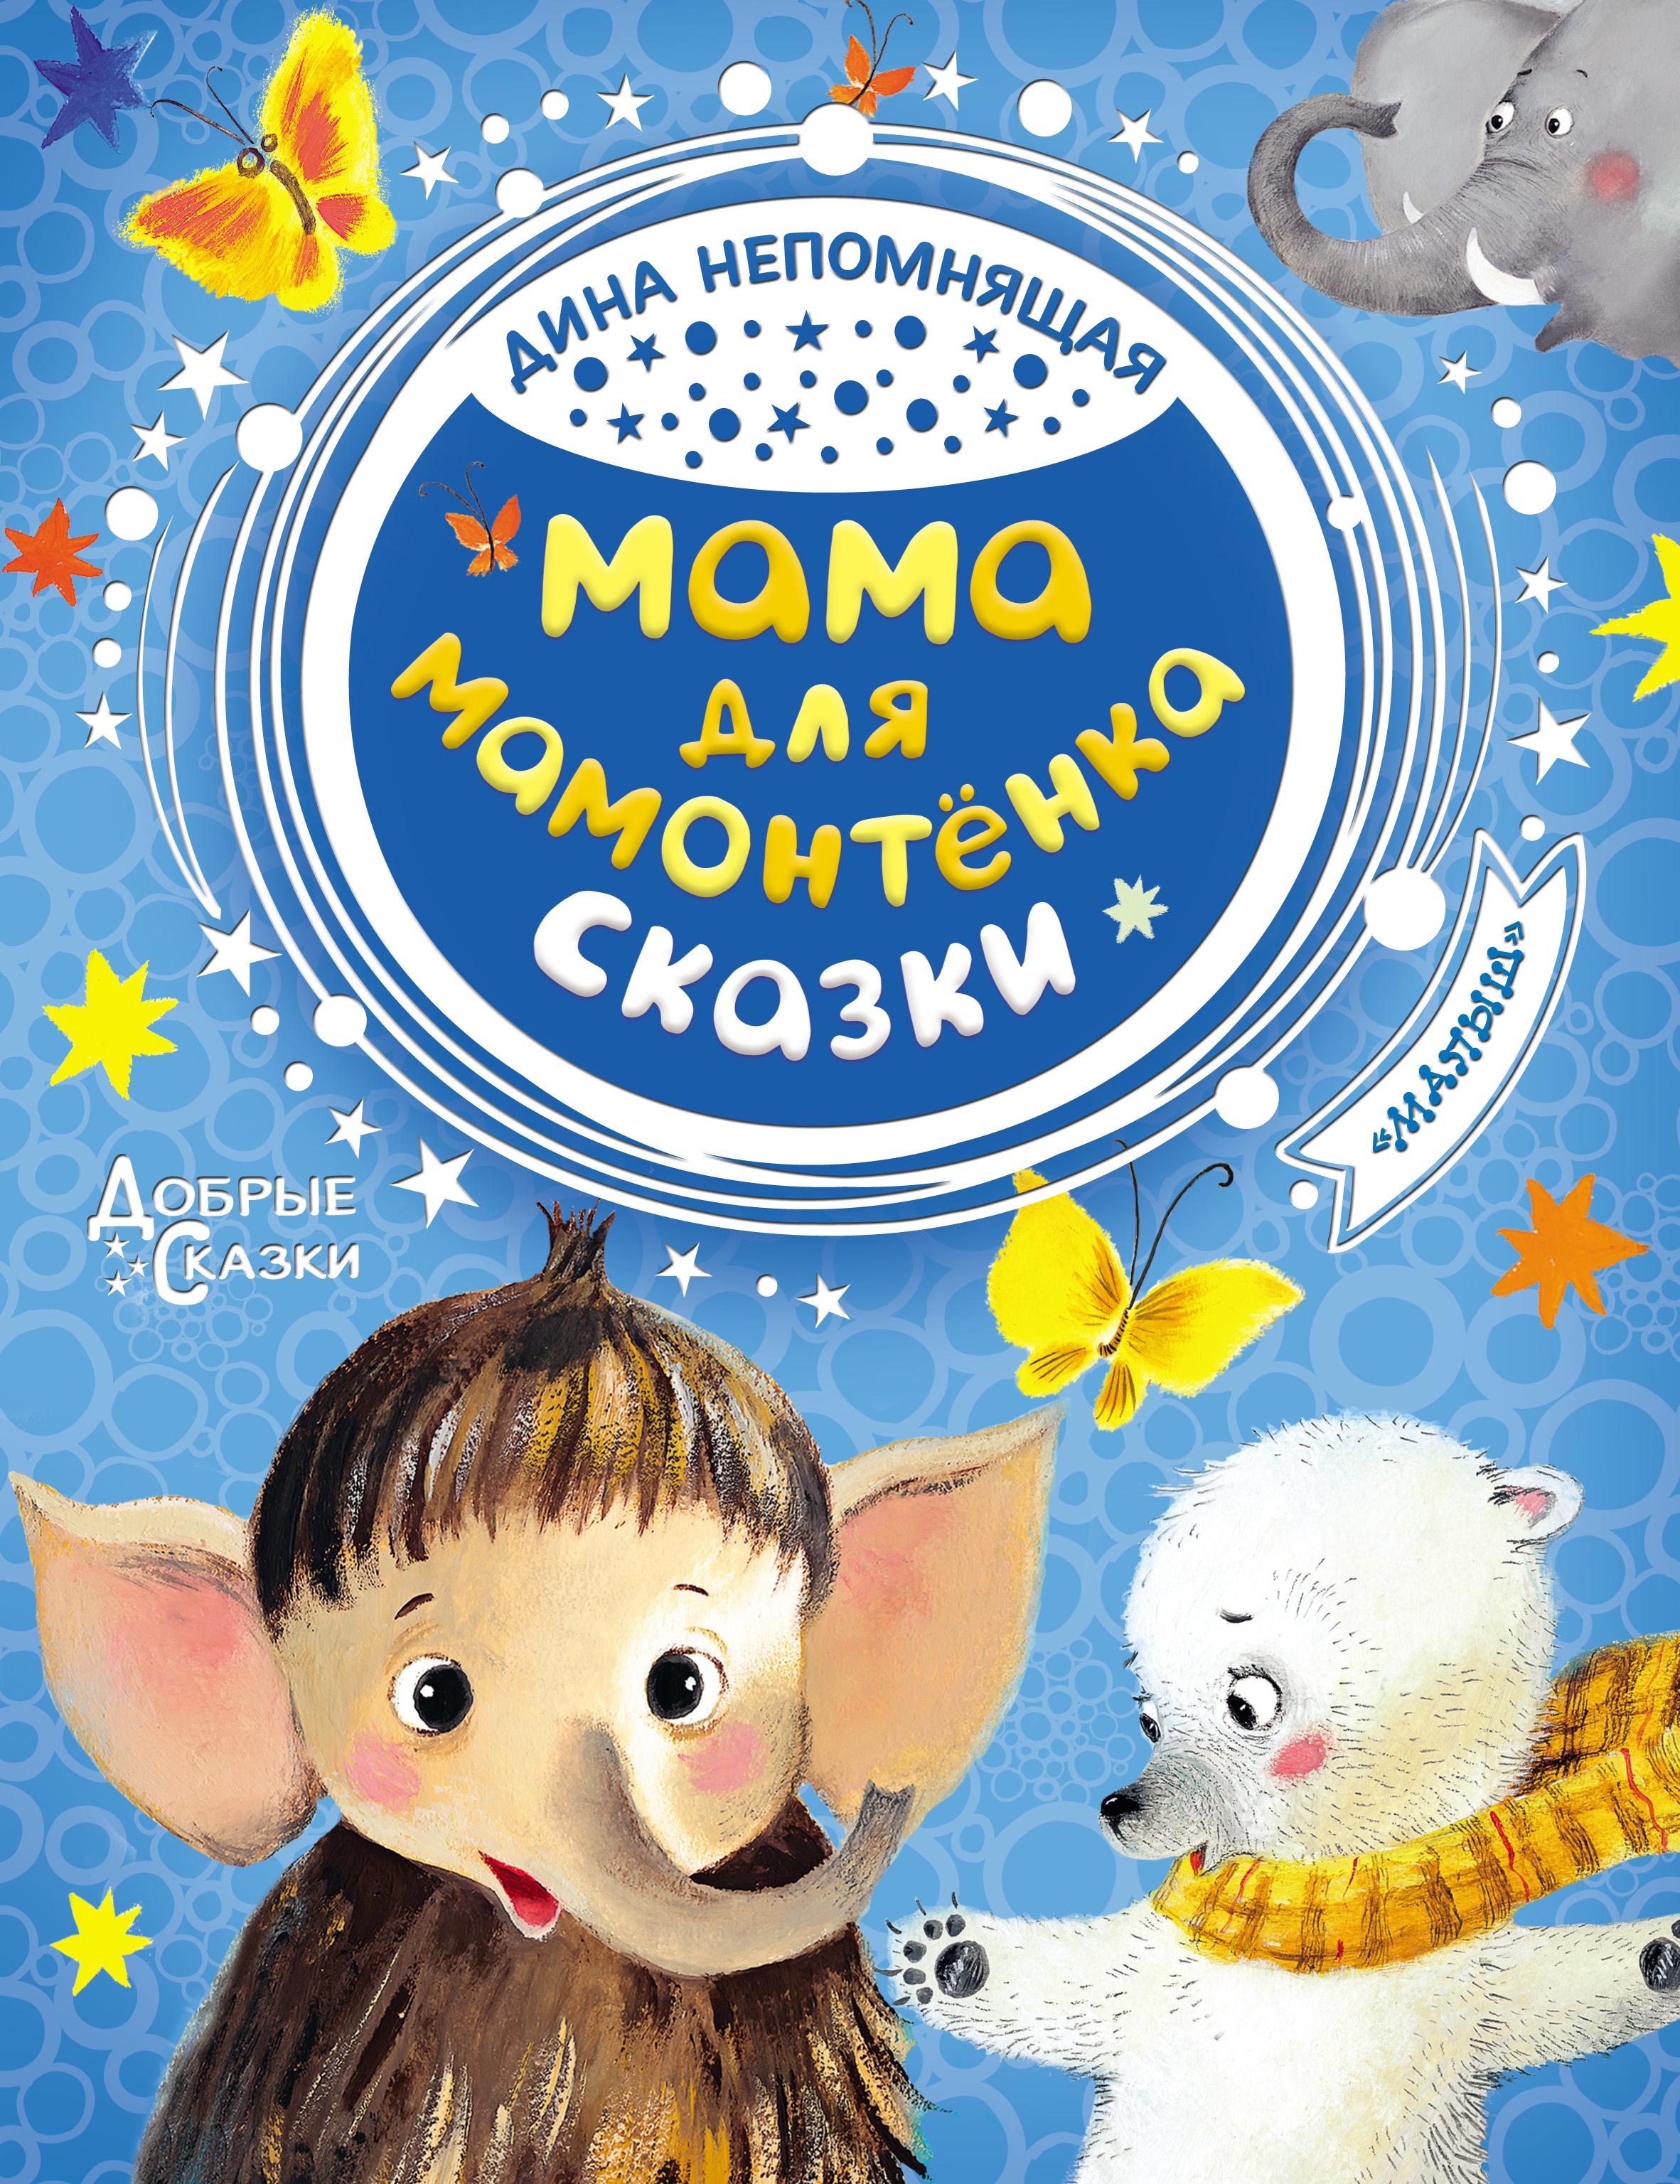 Дина Непомнящая Мама для мамонтёнка непомнящая д мама для мамонтёнка